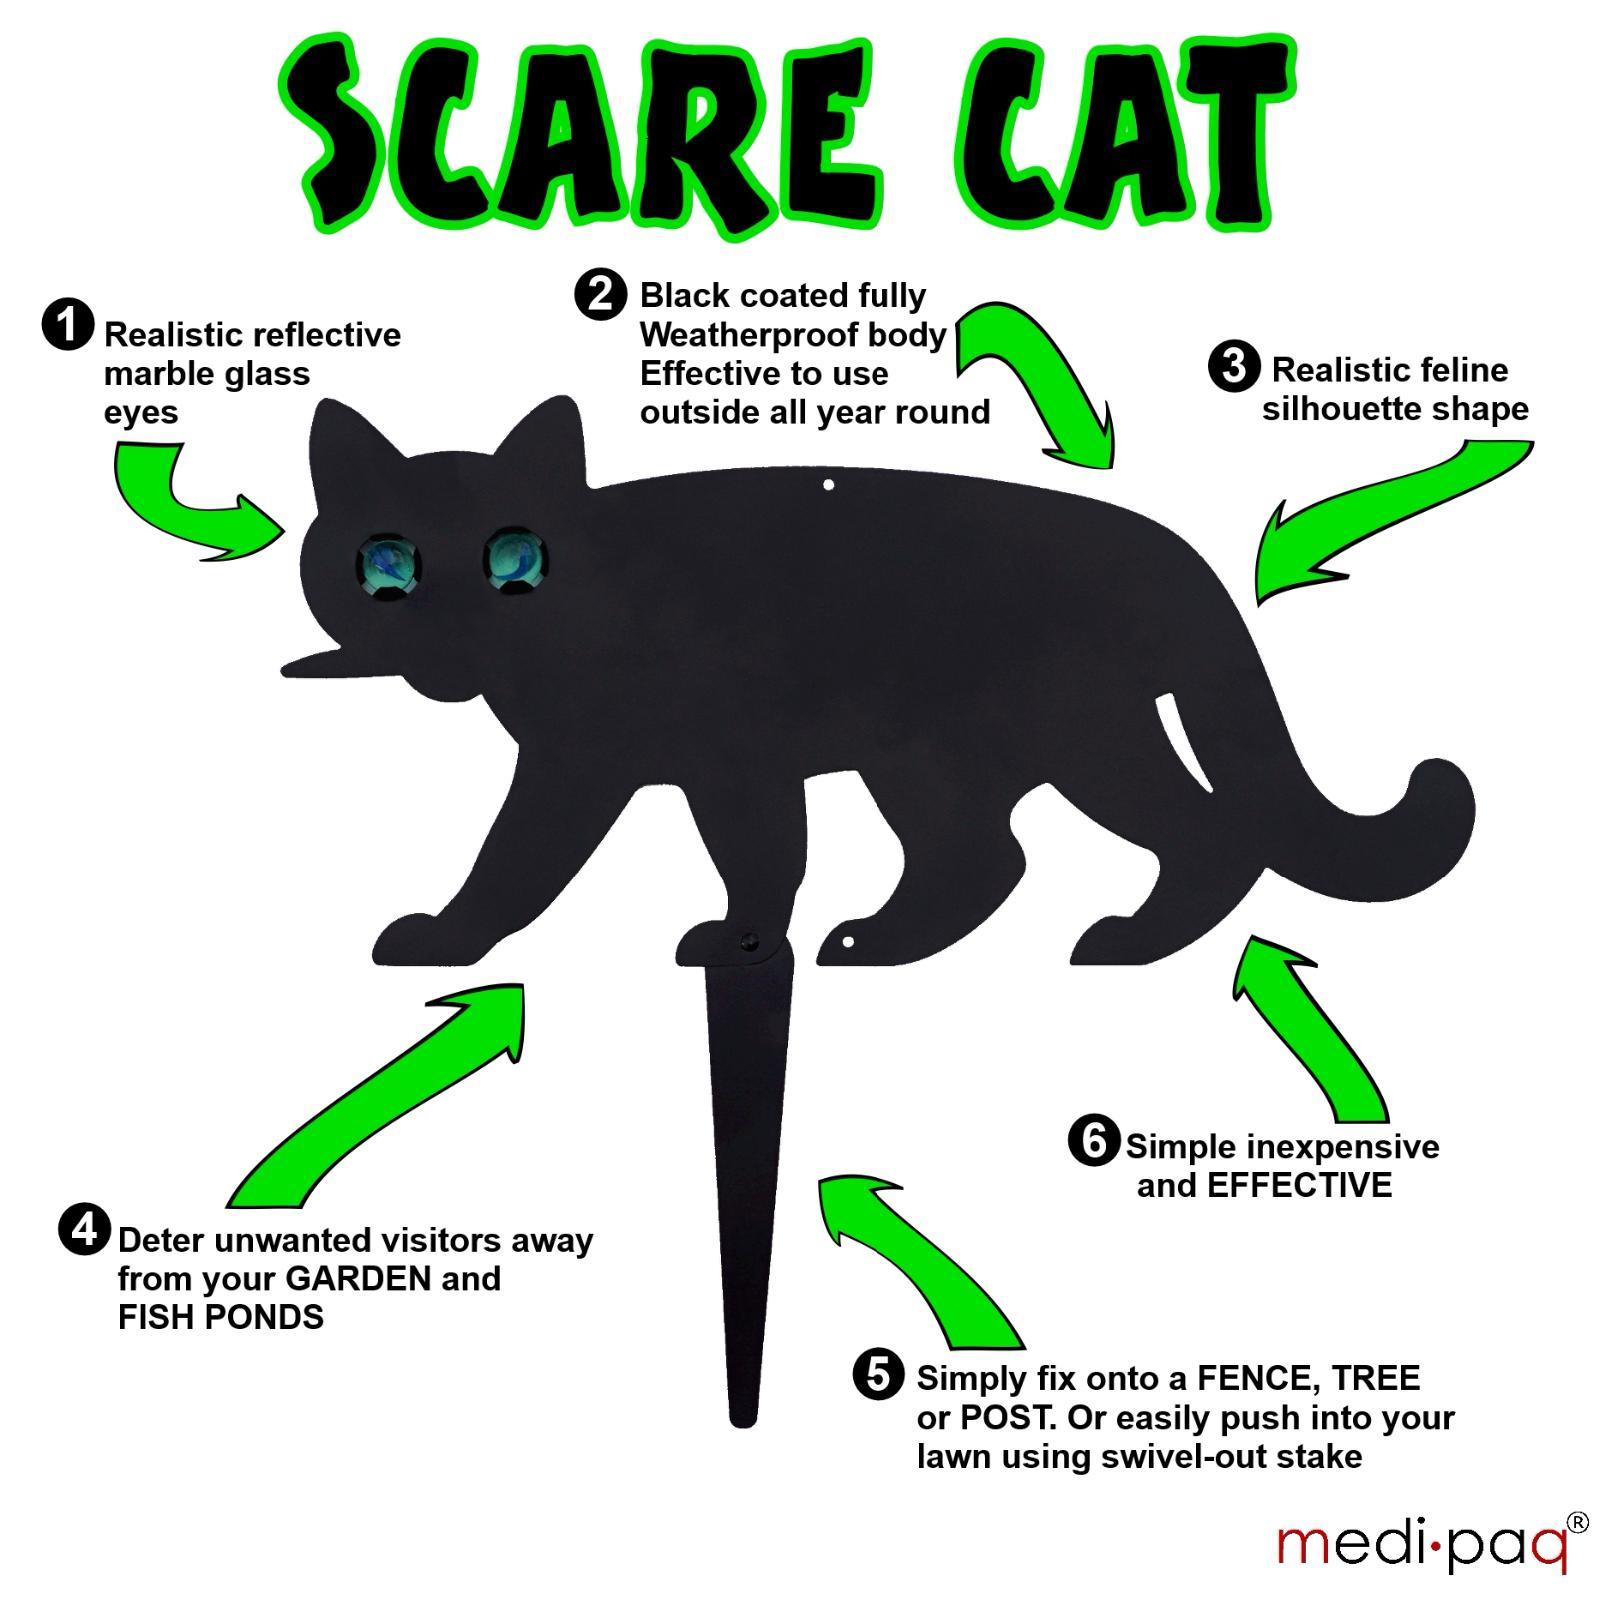 Summer Solutions For Pests Yard Work More: 2x SCARE CAT Garden Scarer Stop Pest Control Deterrent